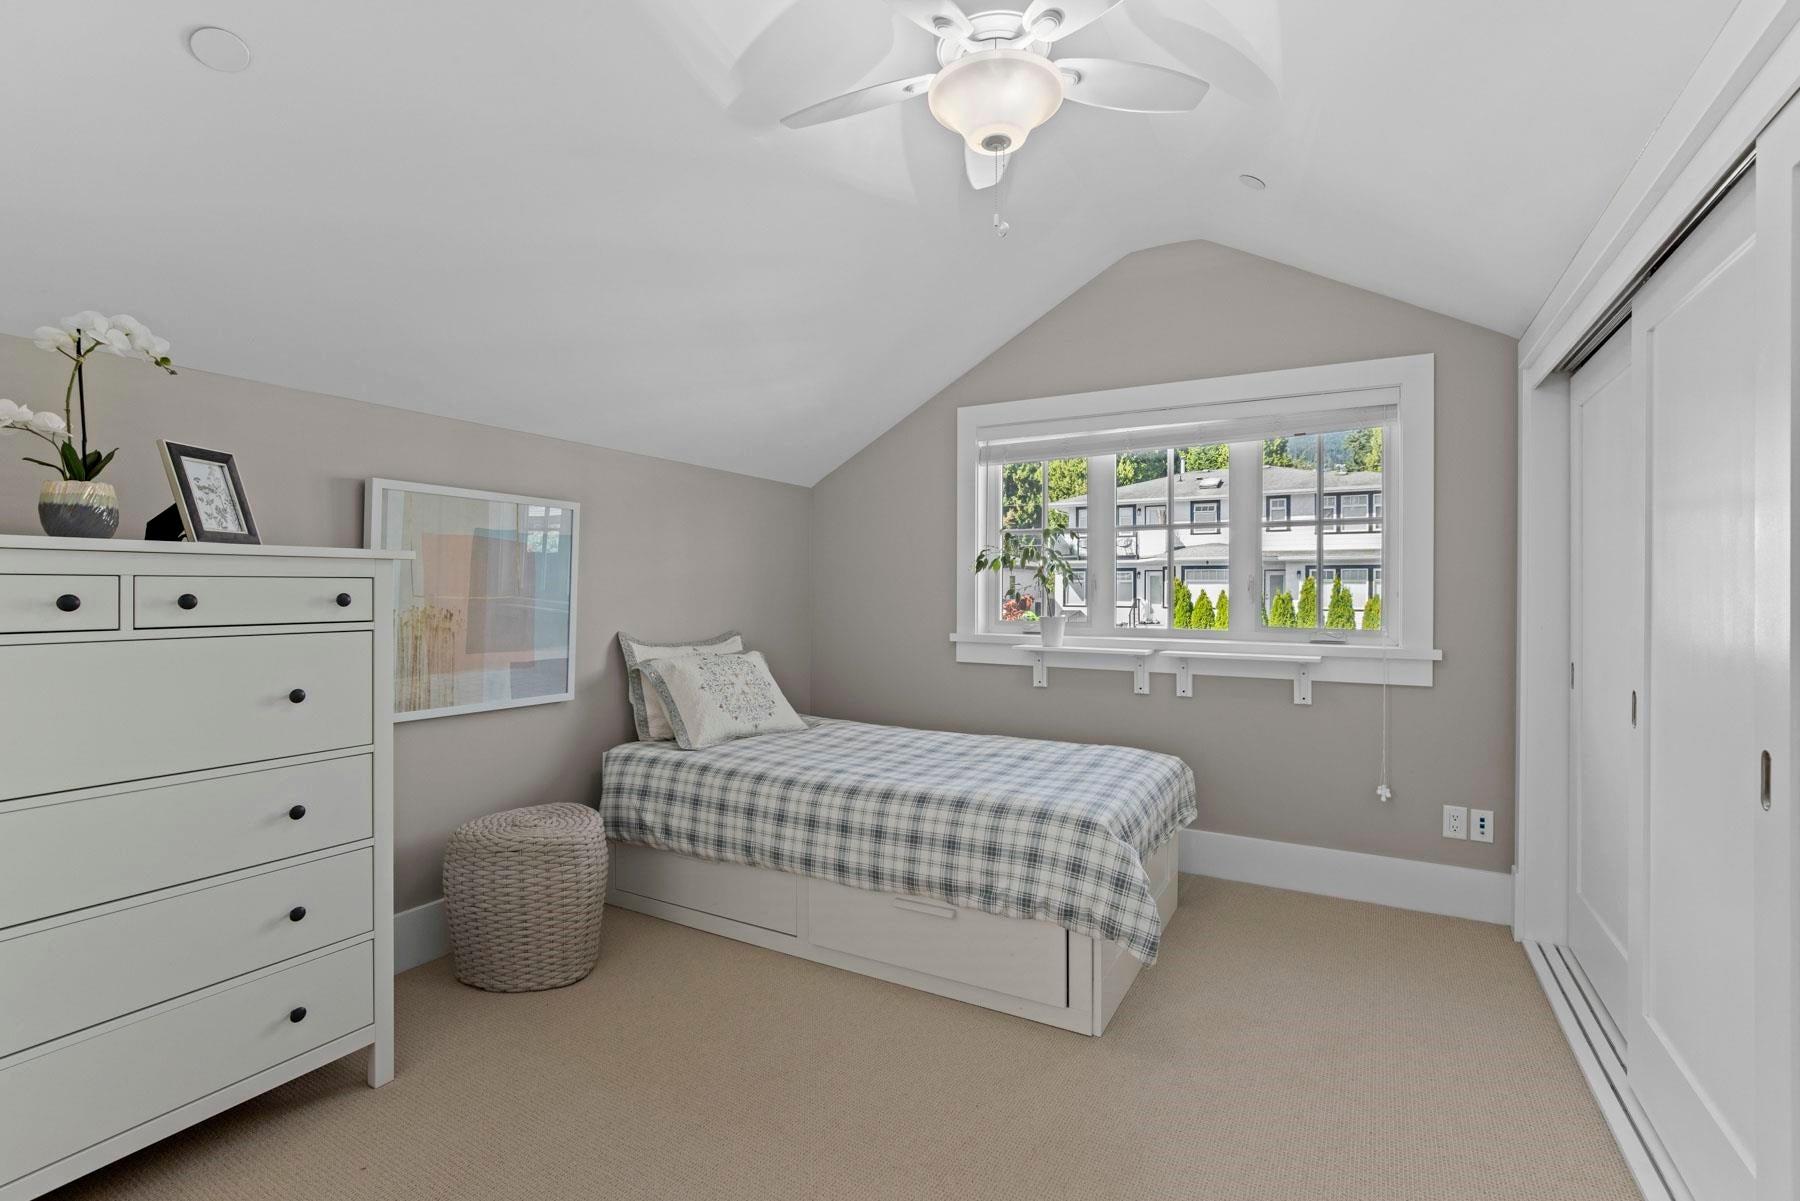 1421 GORDON AVENUE - Ambleside House/Single Family for sale, 3 Bedrooms (R2617756) - #13